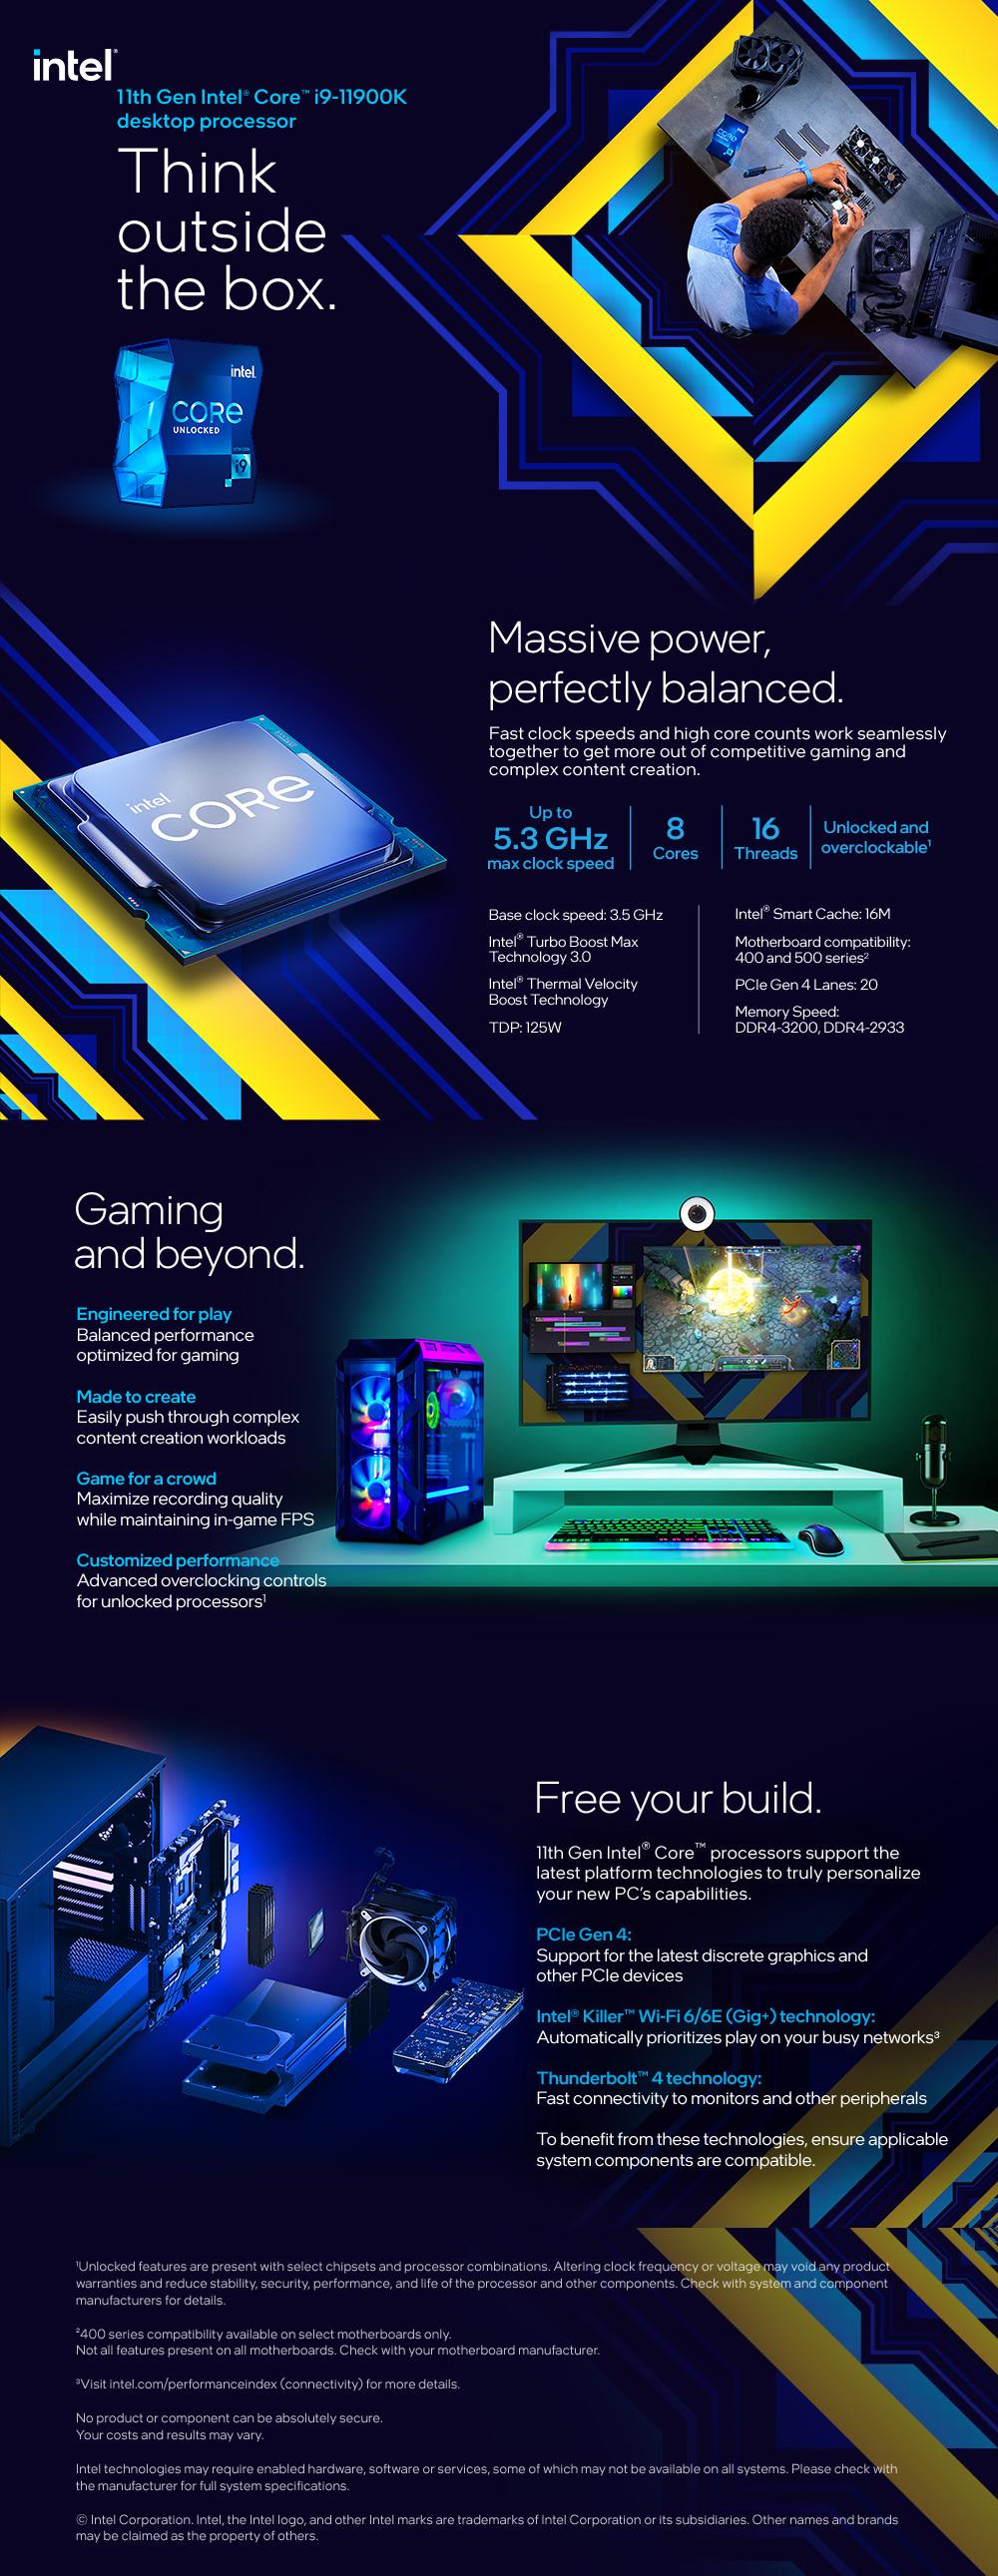 Intel Core i7-11900k